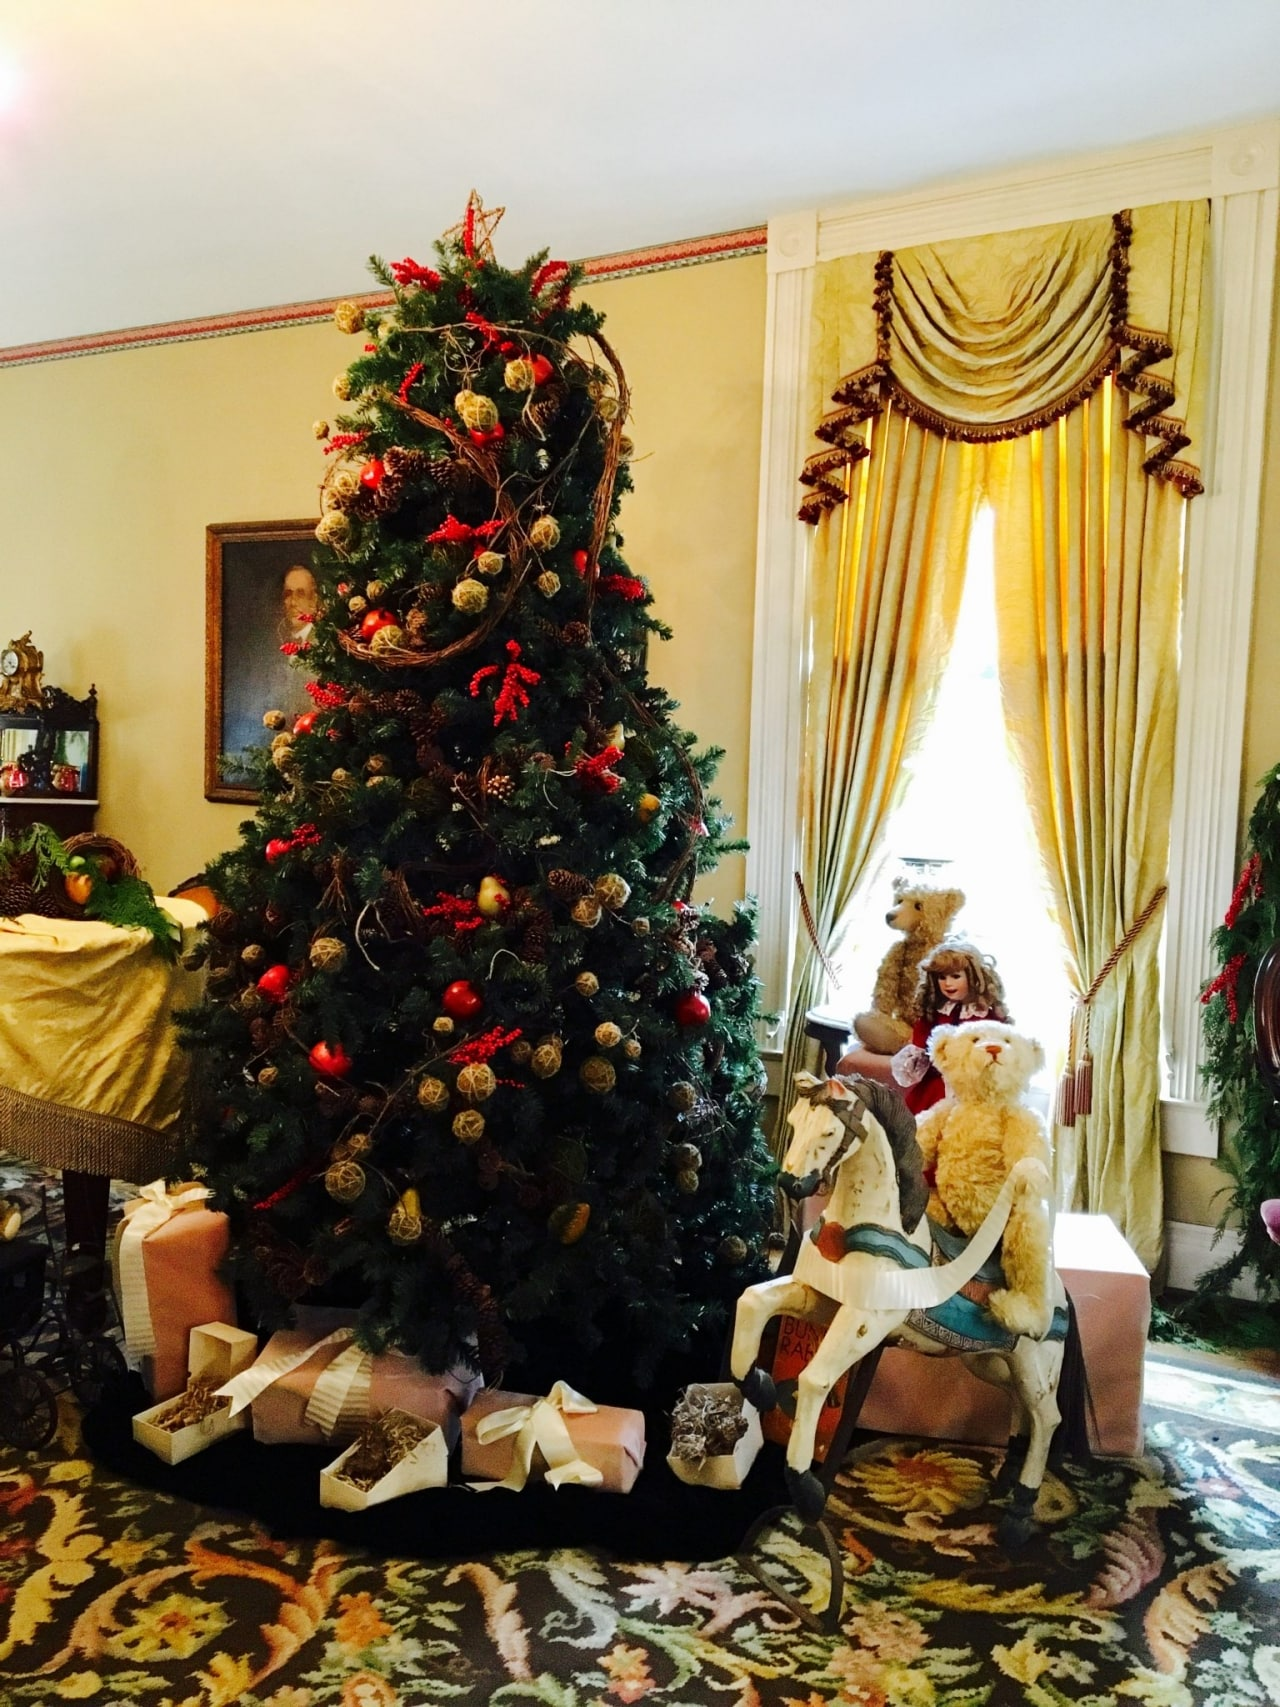 Arlington Christmas Weekend 2020 Birmingham Al Christmas at Arlington Antebellum Home and Gardens (slideshow